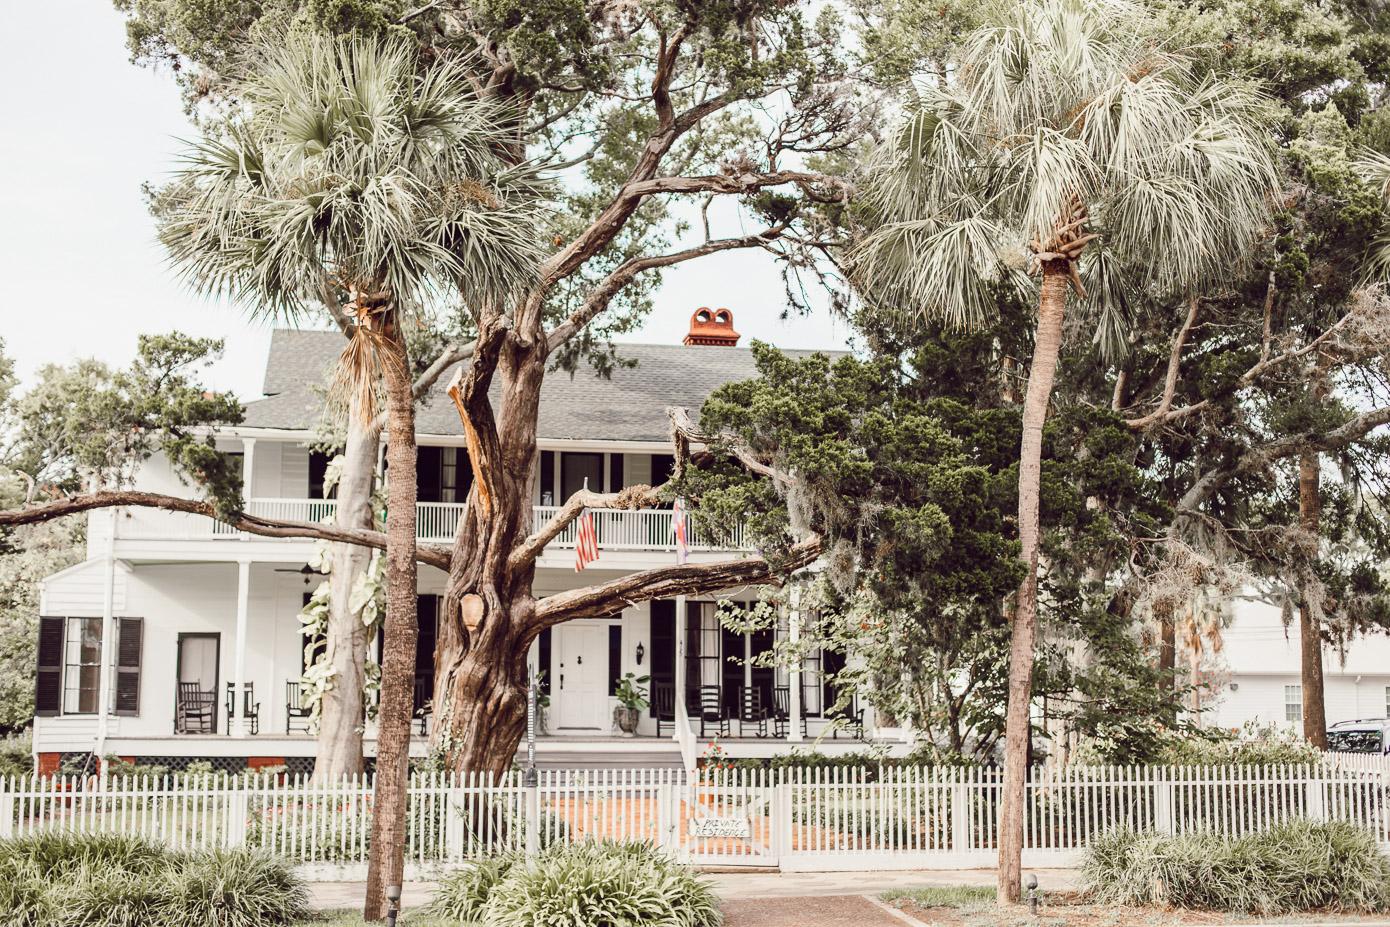 Explore Downtown Fernandina Beach | Louella Reese